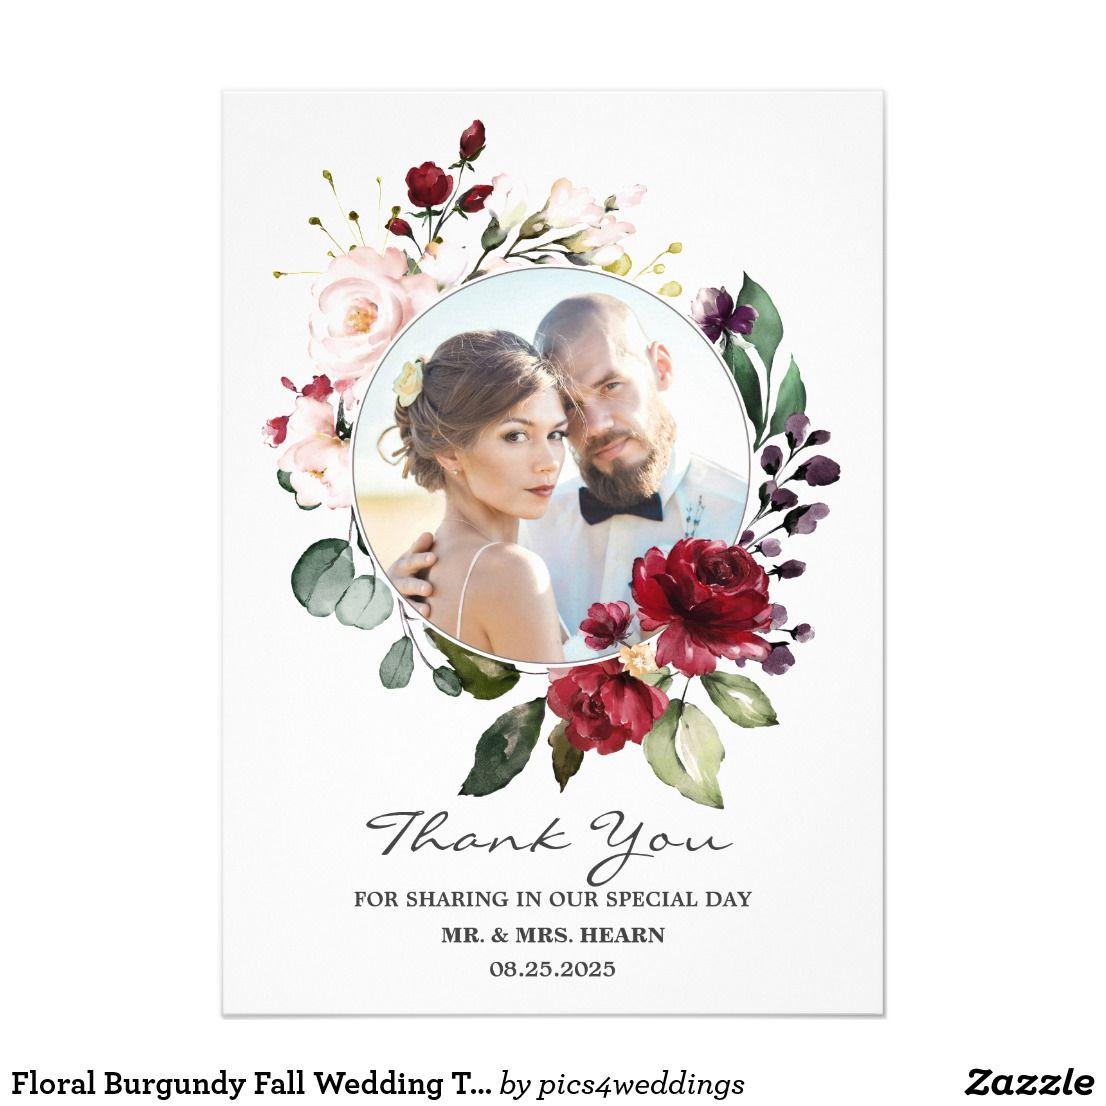 Floral Burgundy Fall Wedding Thank You Photo Card